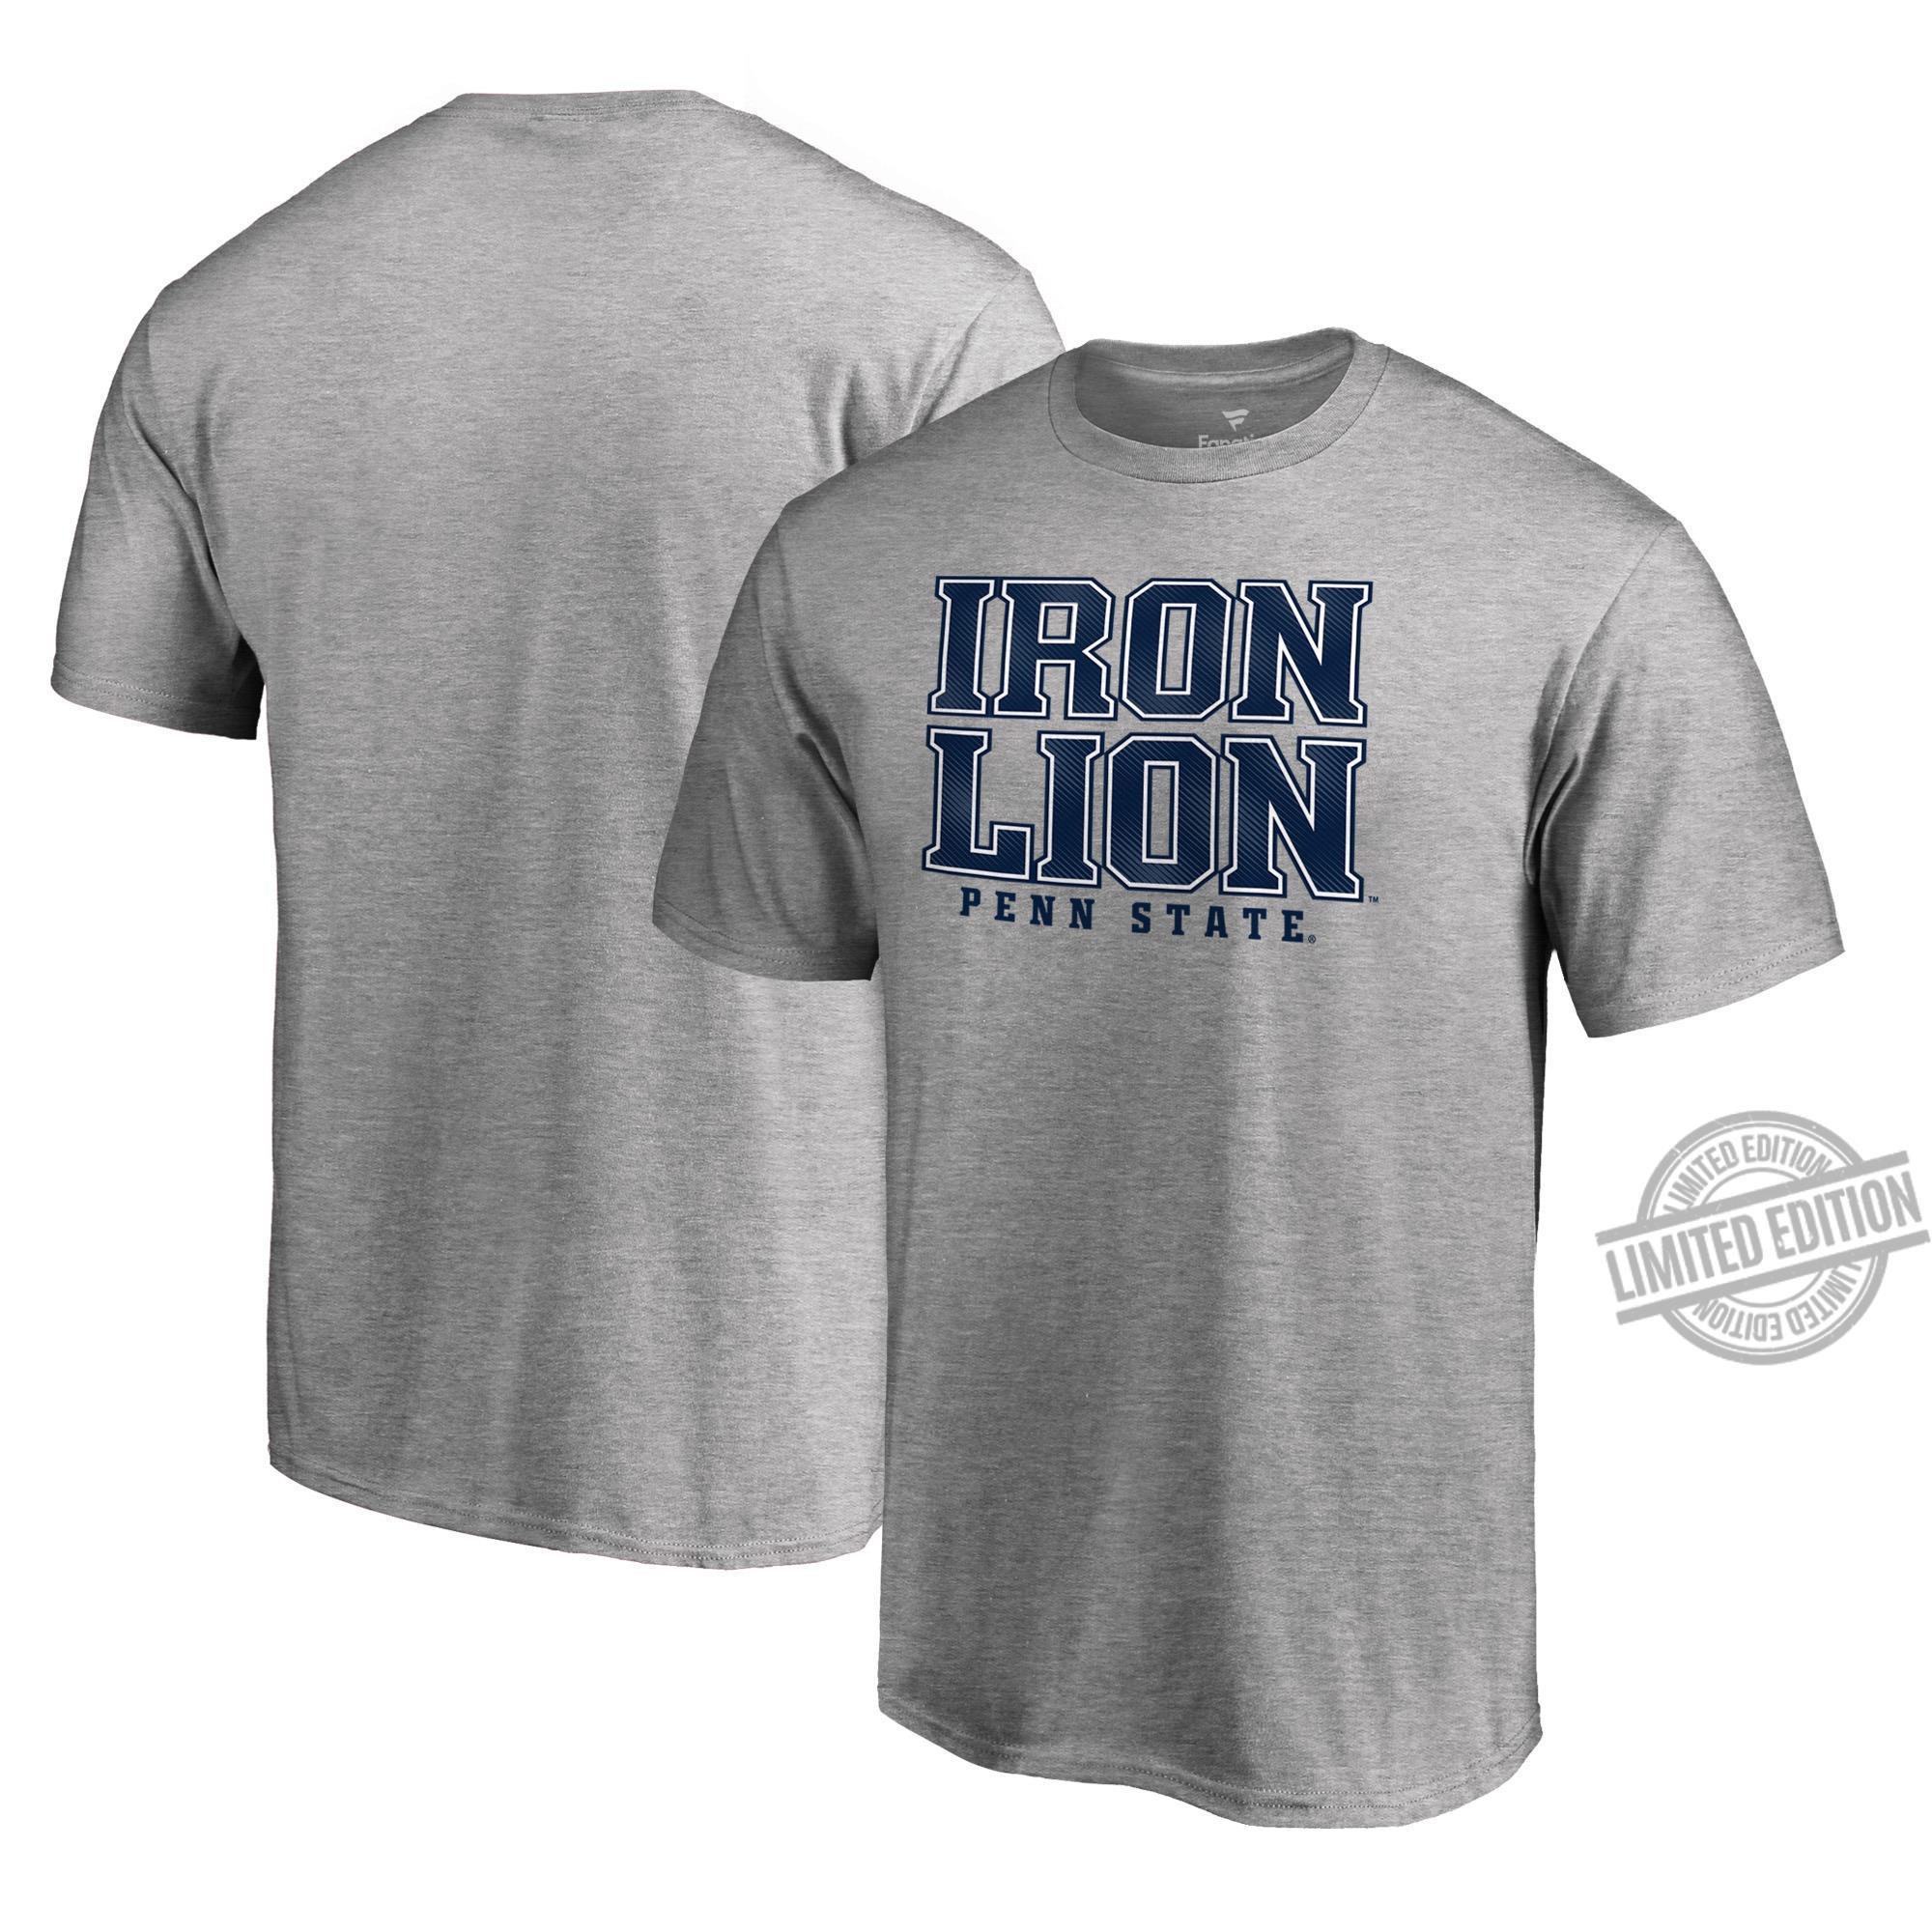 Iron Lion Penn State Shirt